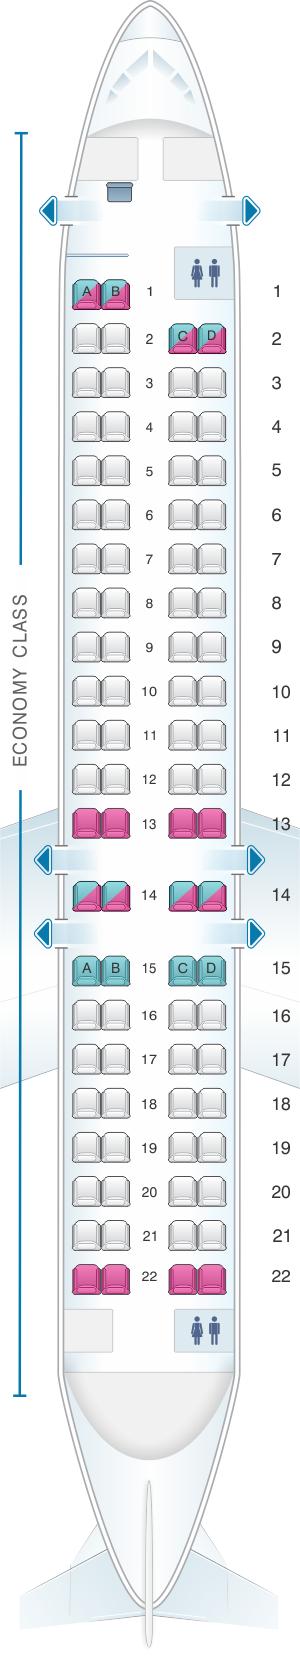 Seat map for Adria Airways Bombardier CRJ 900LR